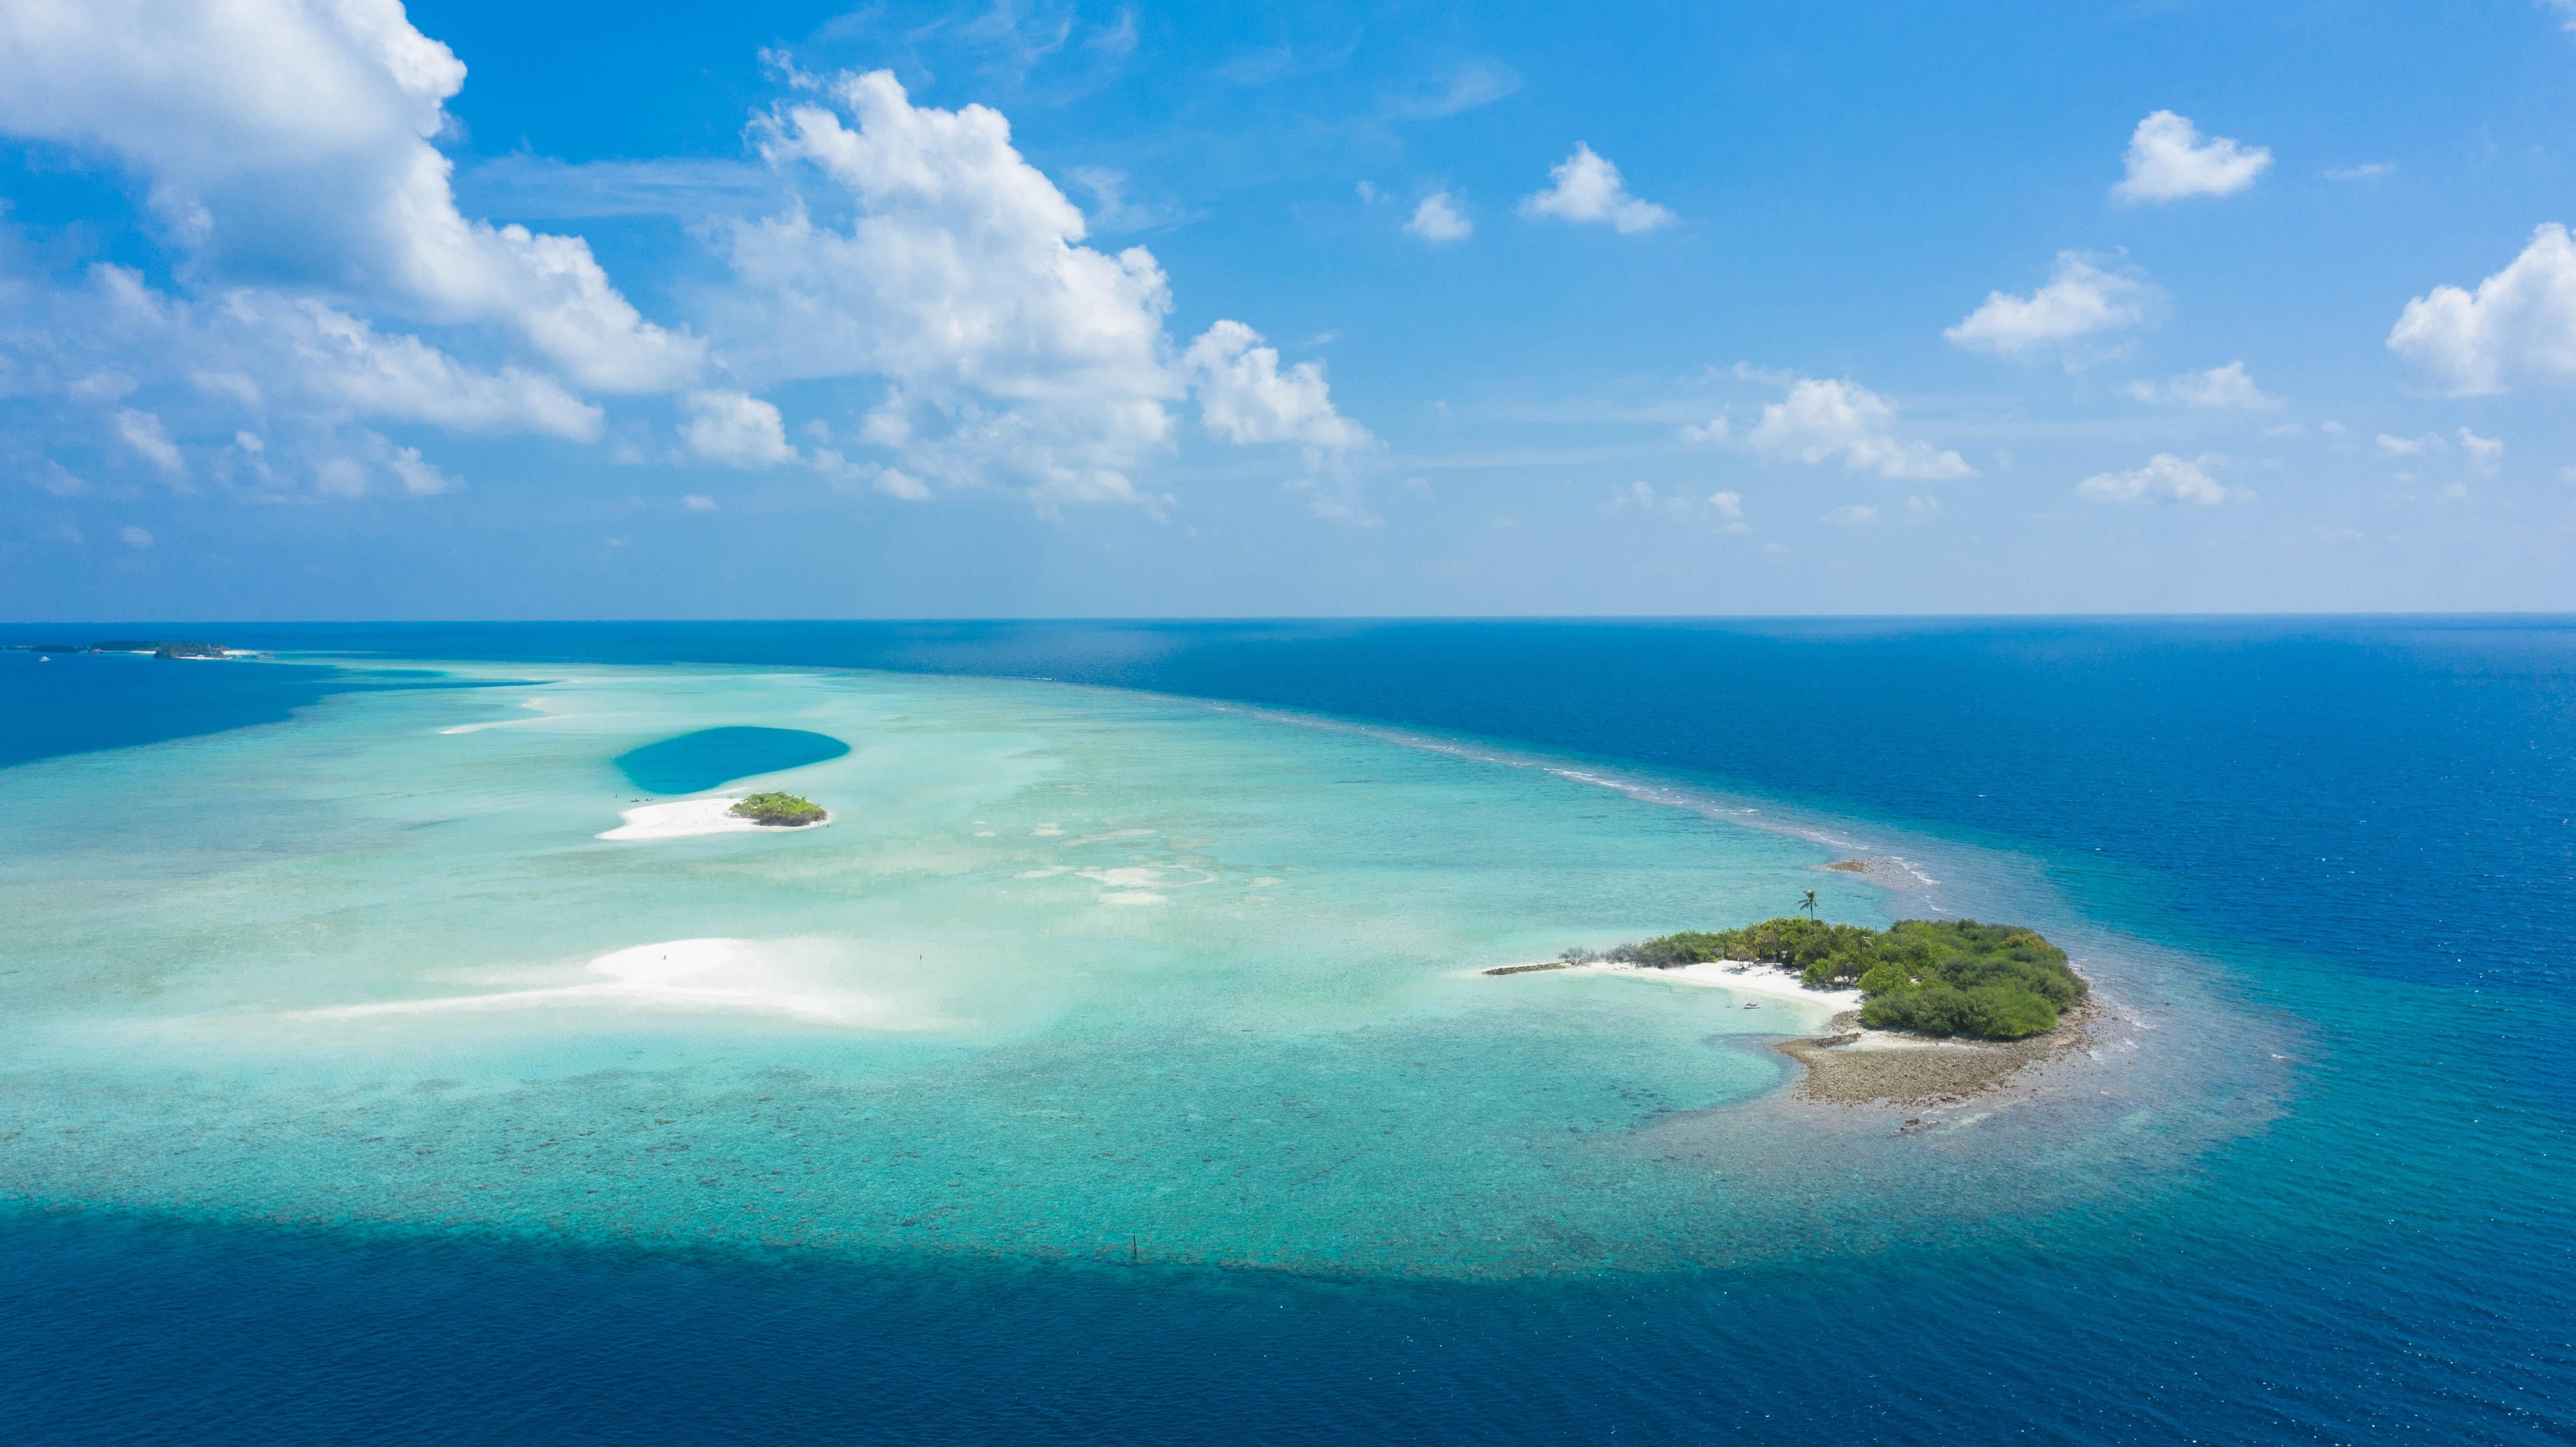 10 days in Maldives